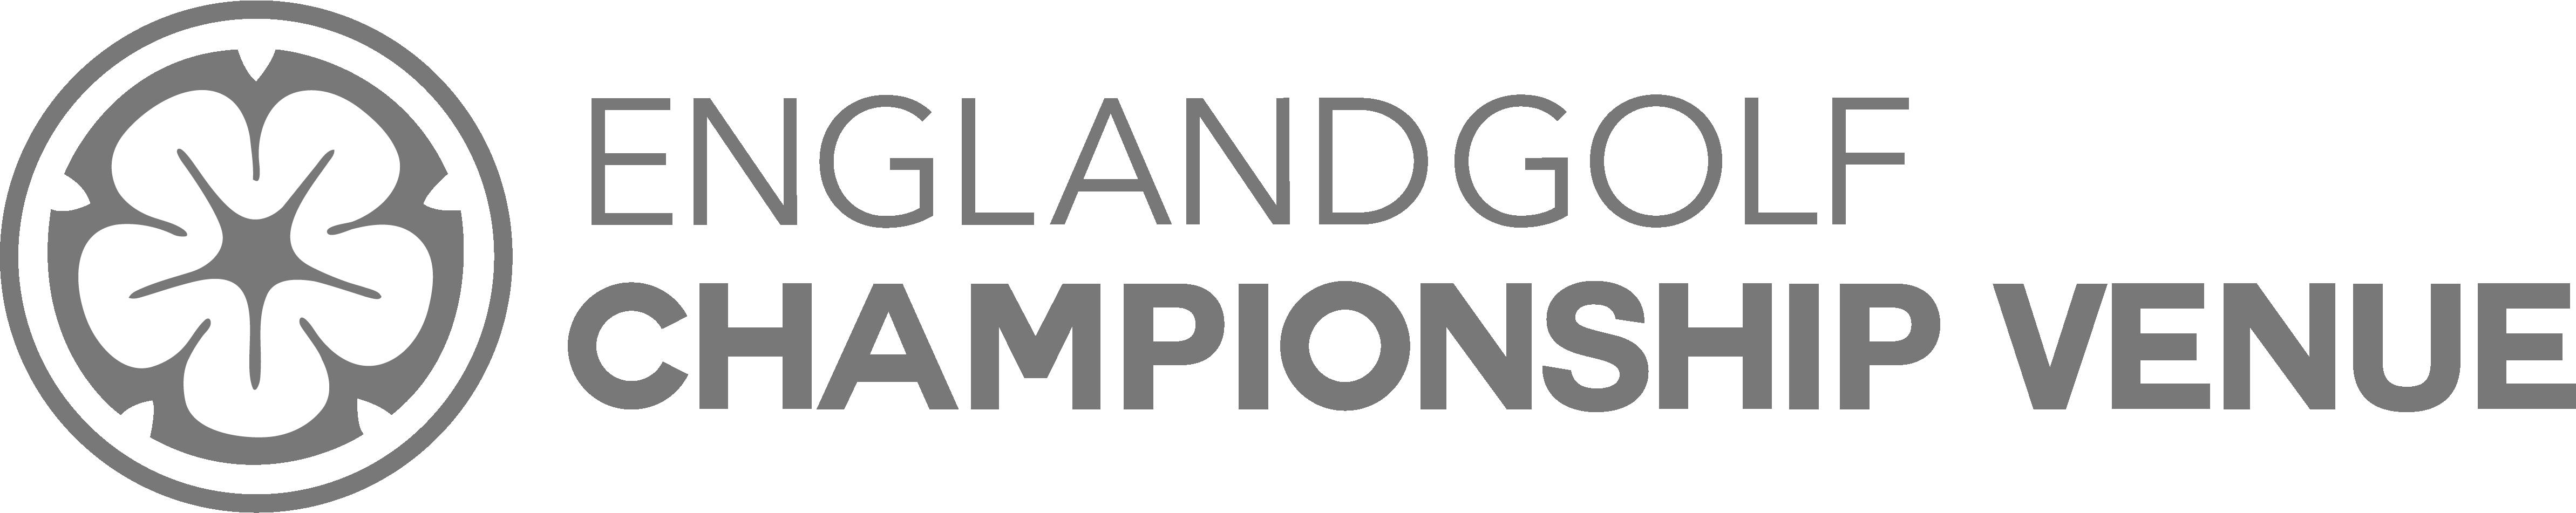 England Golf Championship Venue